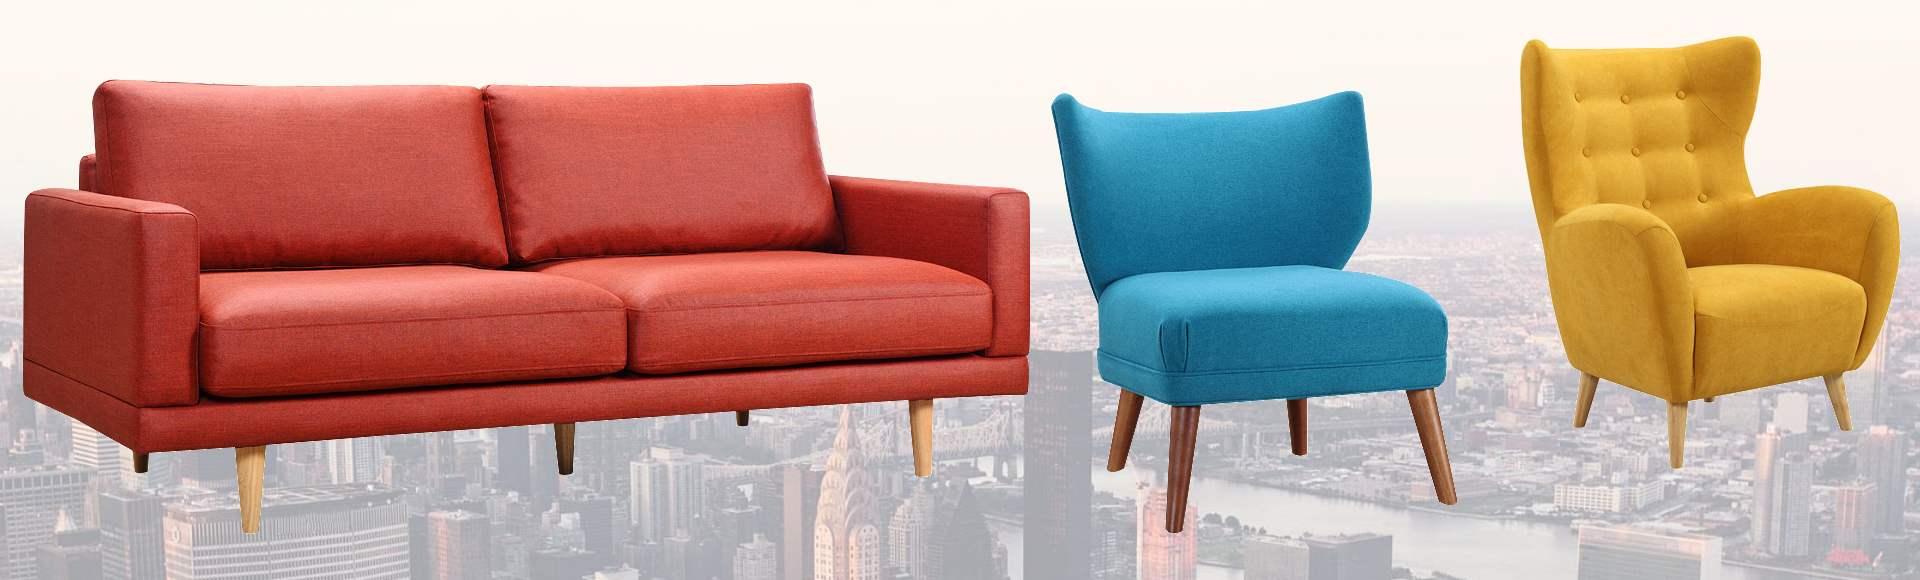 Beautiful ... Comfort Urban Chic Upholstery